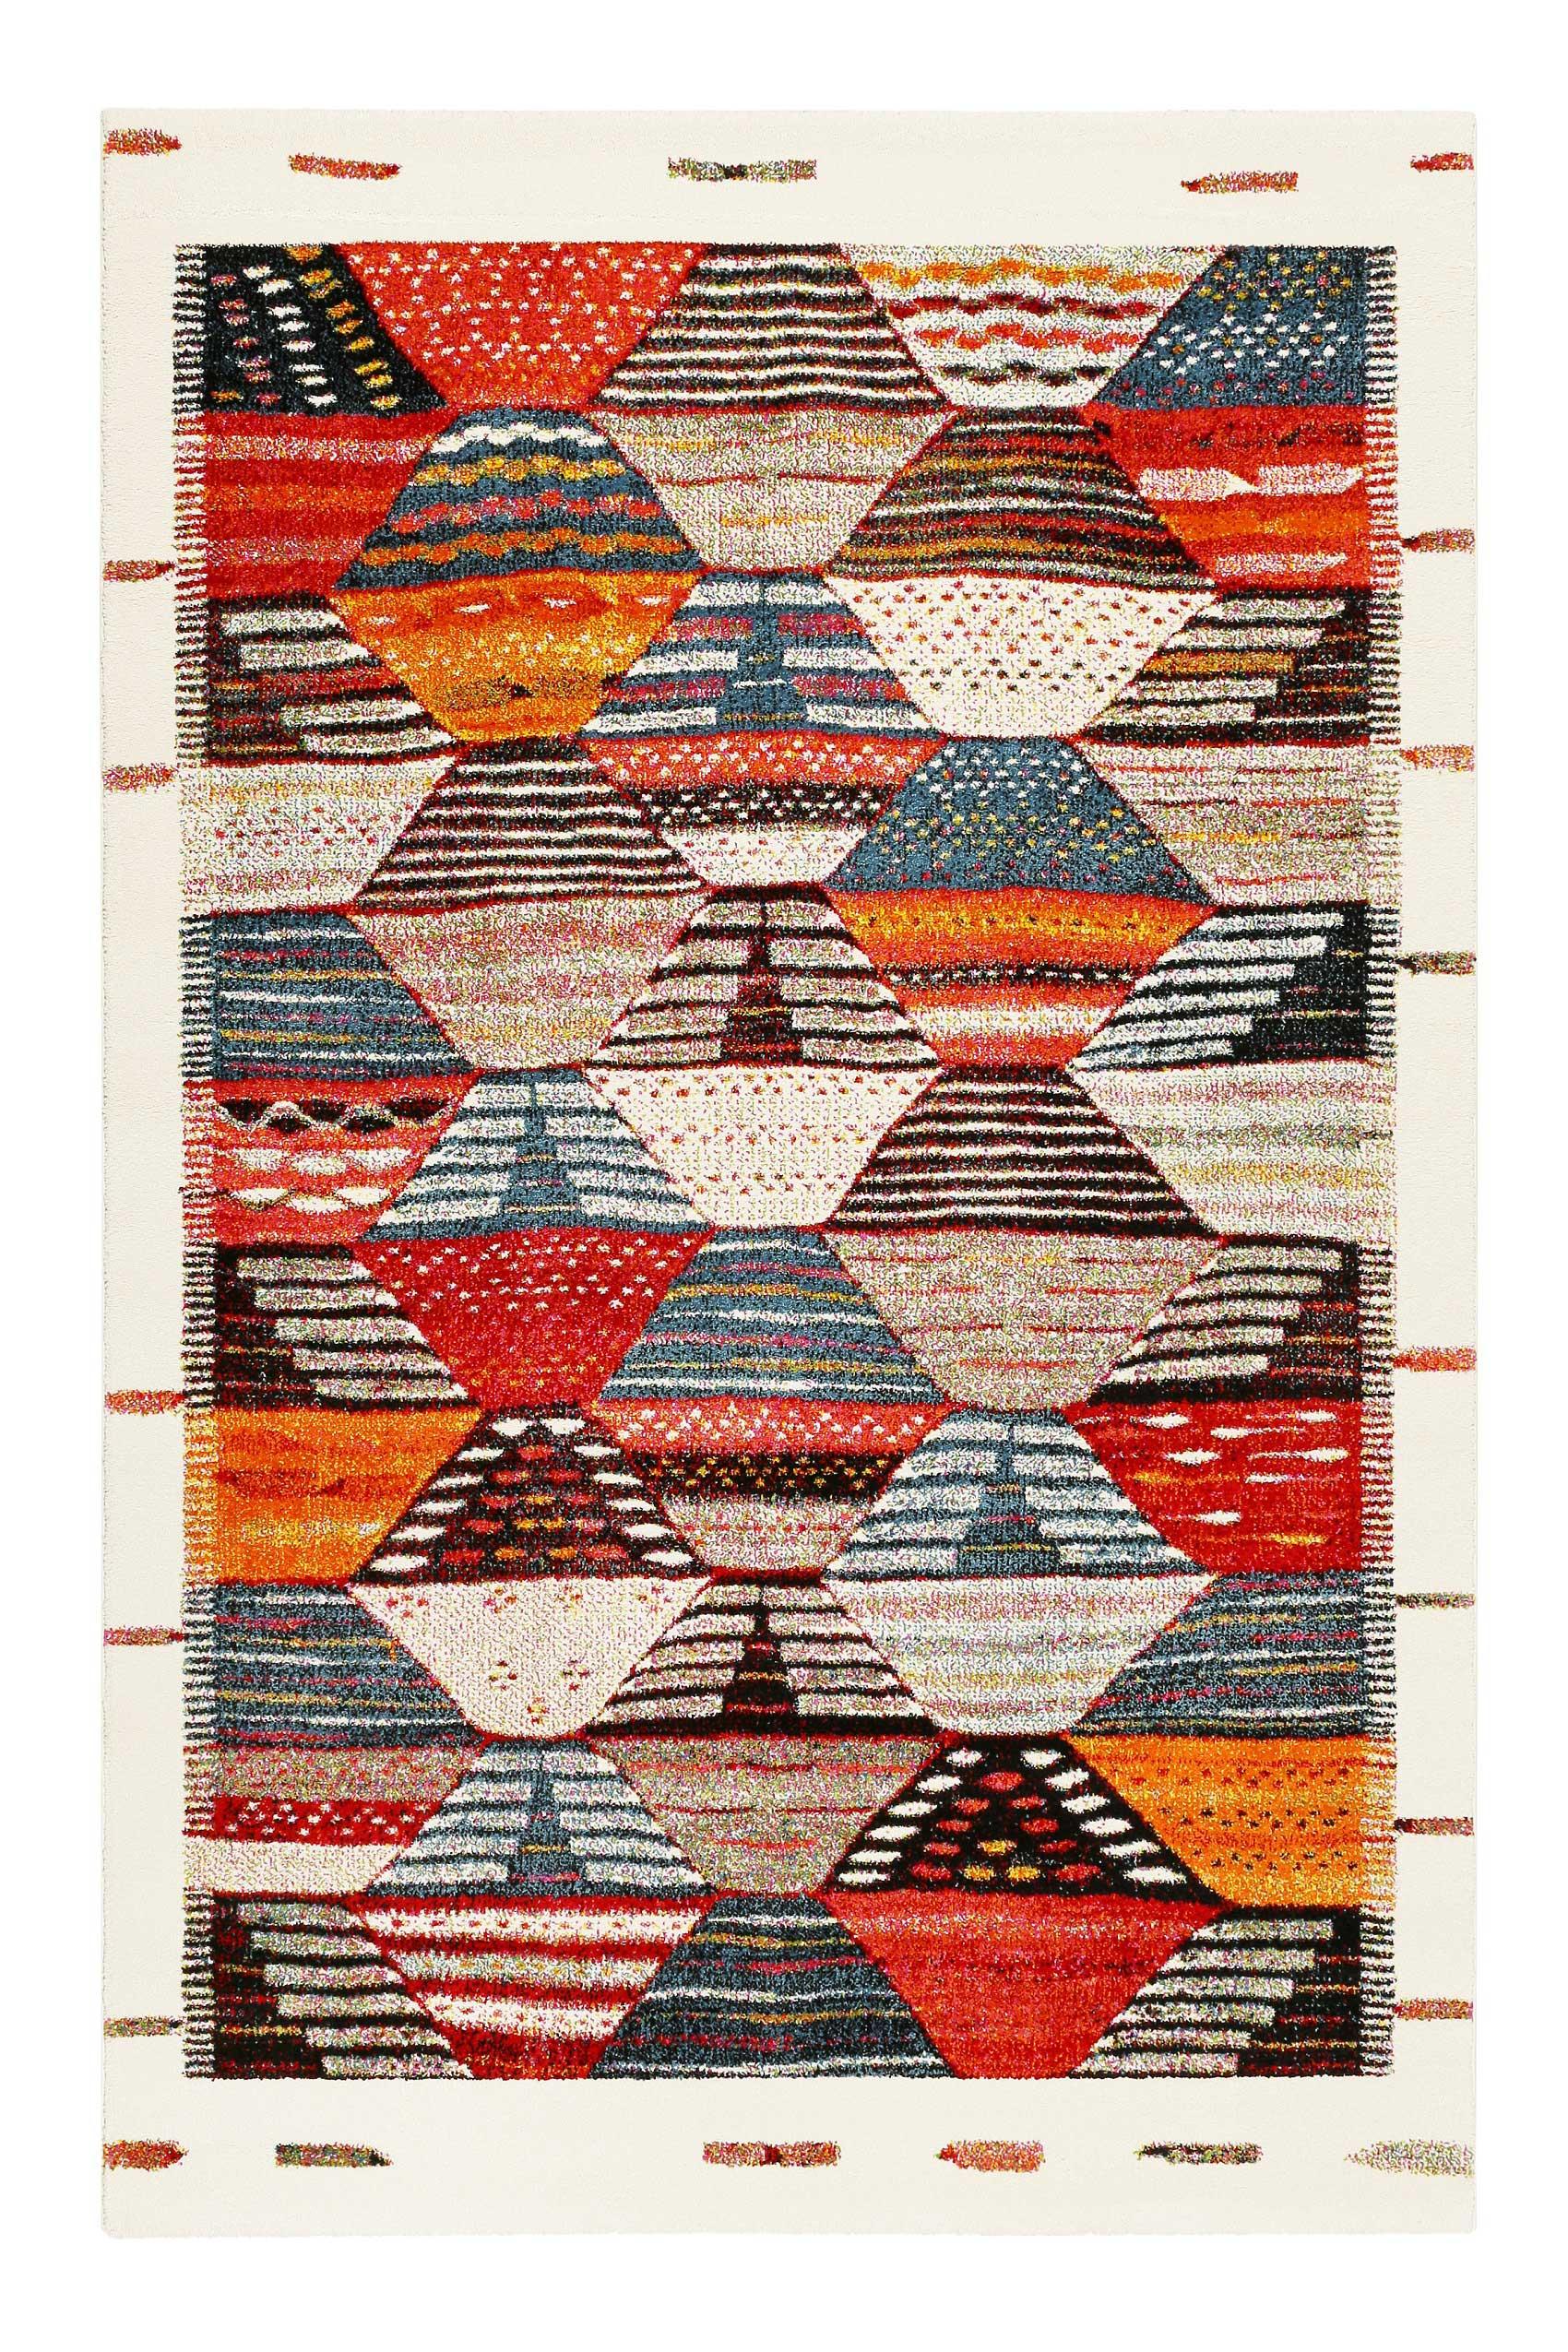 Tapis inspiration berbère multicolore pour salon, chambre 200x133